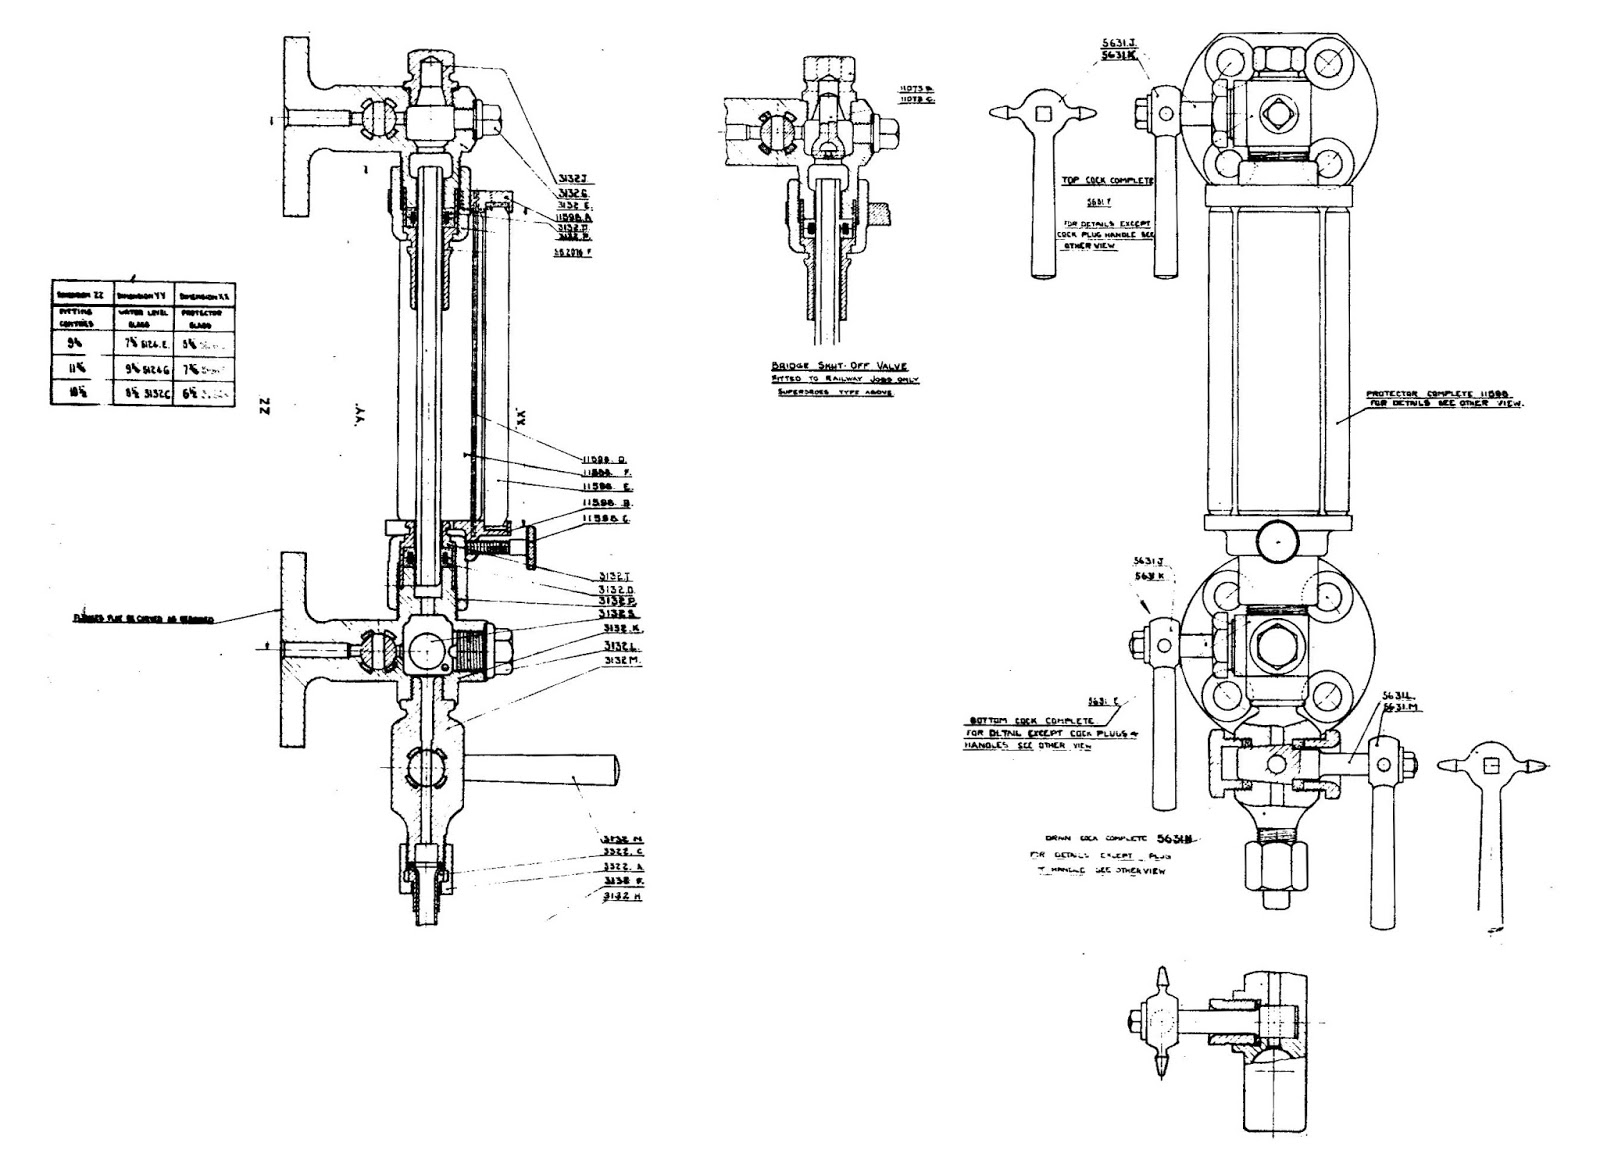 medium resolution of gauge glass valve arrangement similar to 7109 s